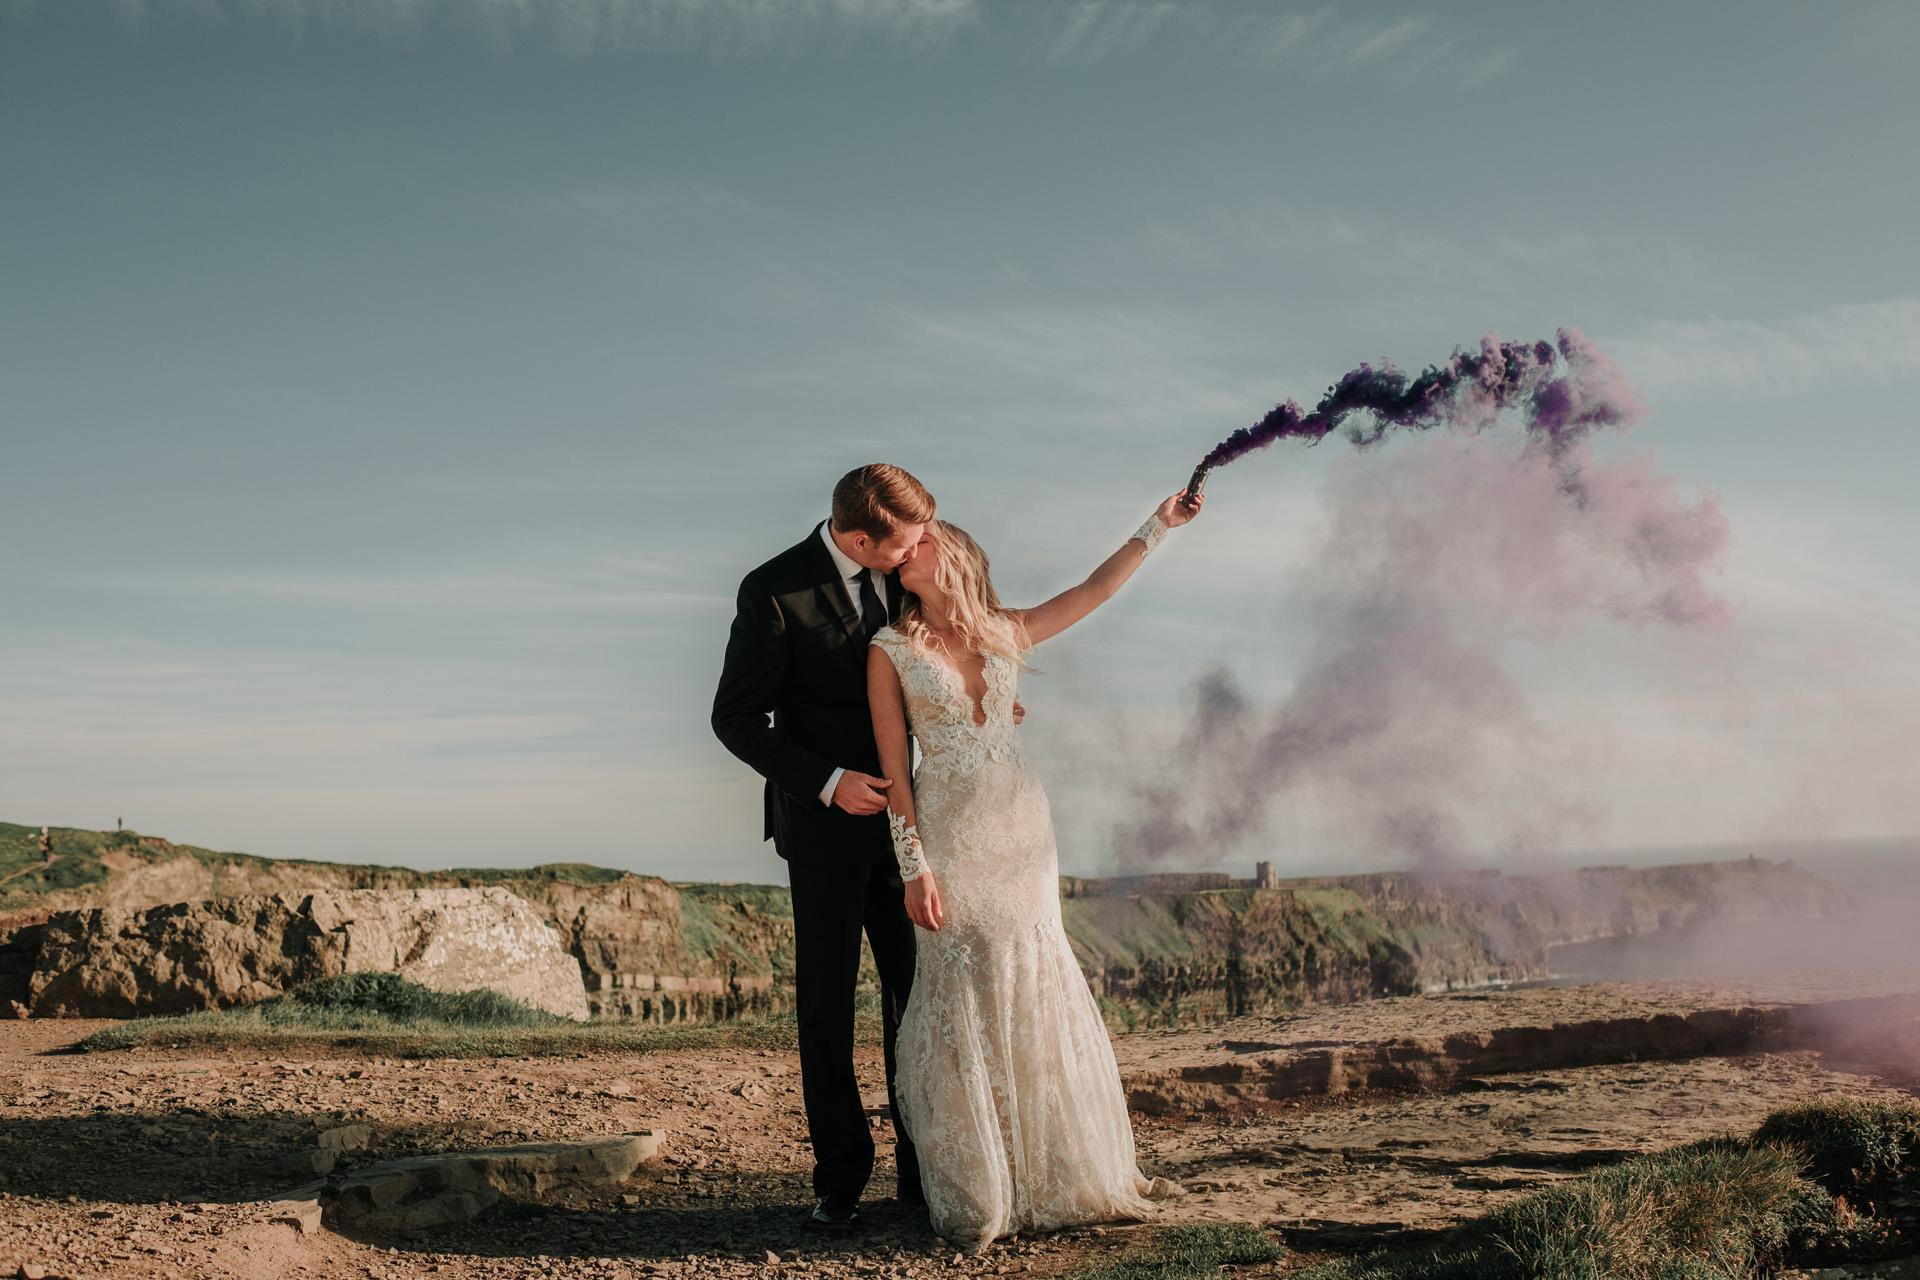 A Wedding At The Cliffs Of Moher Megan Amp Jake David